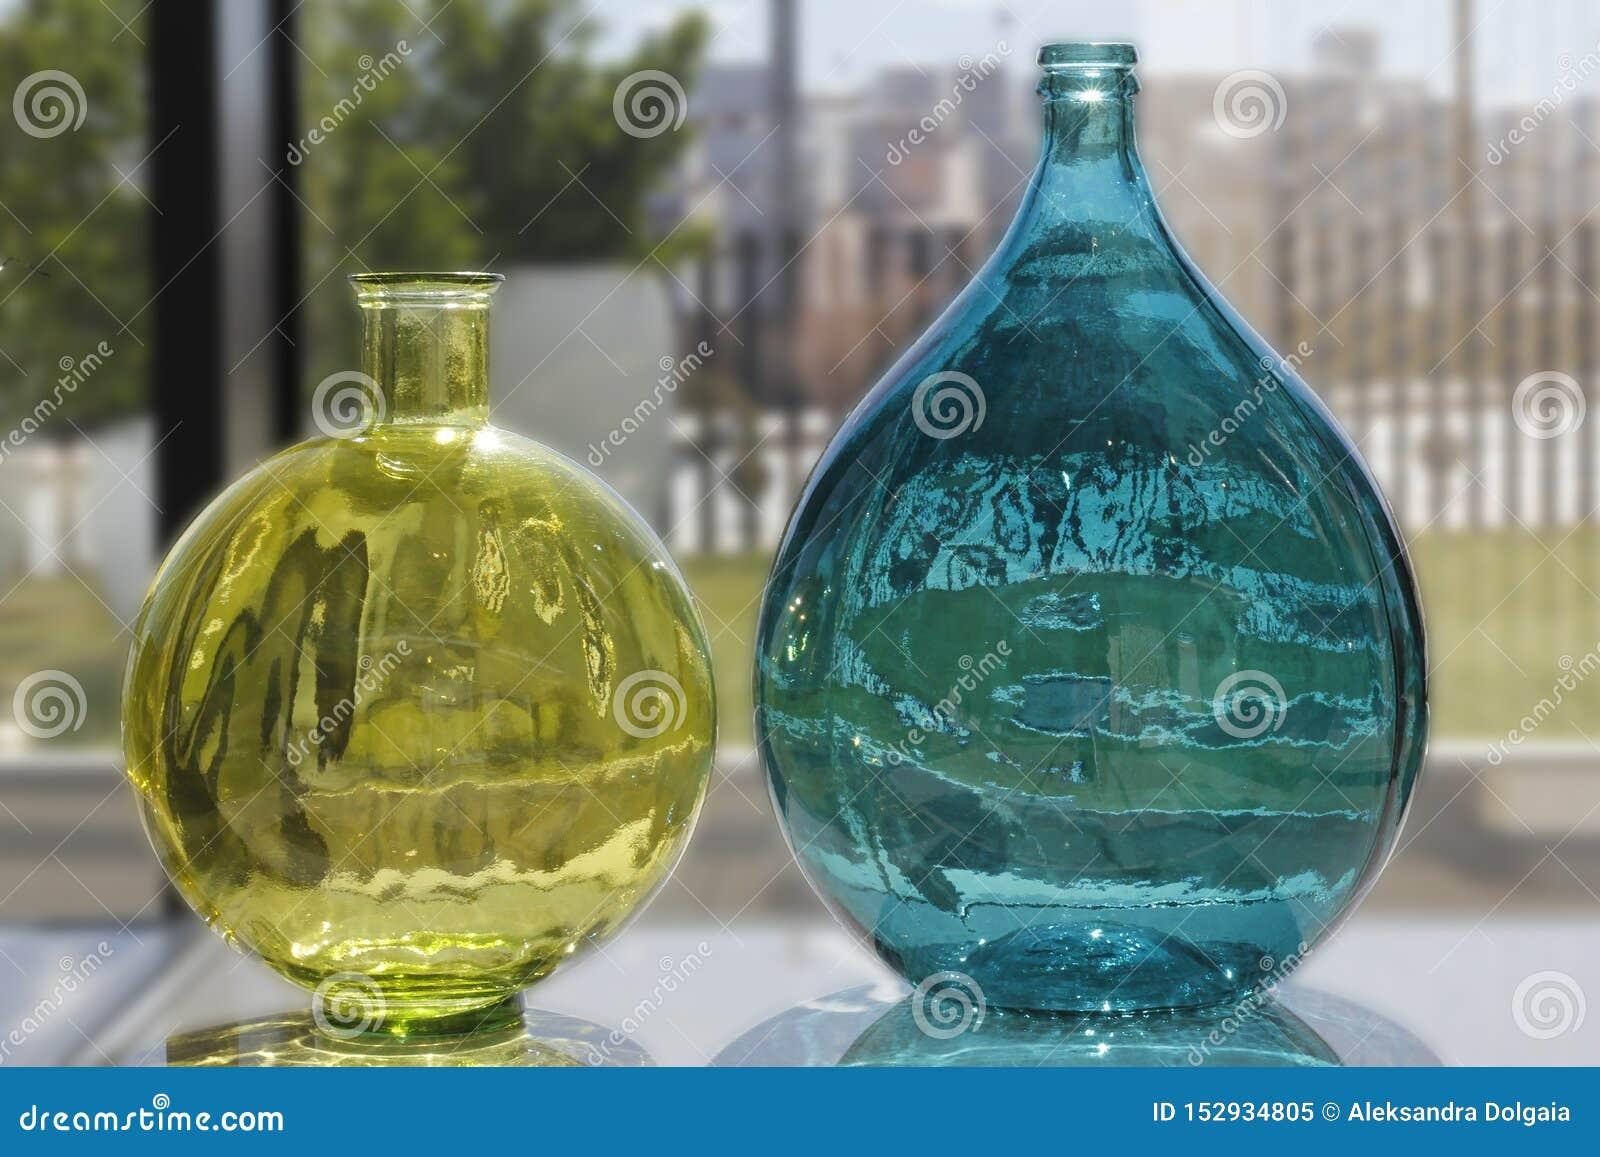 Coloured transparent boottles